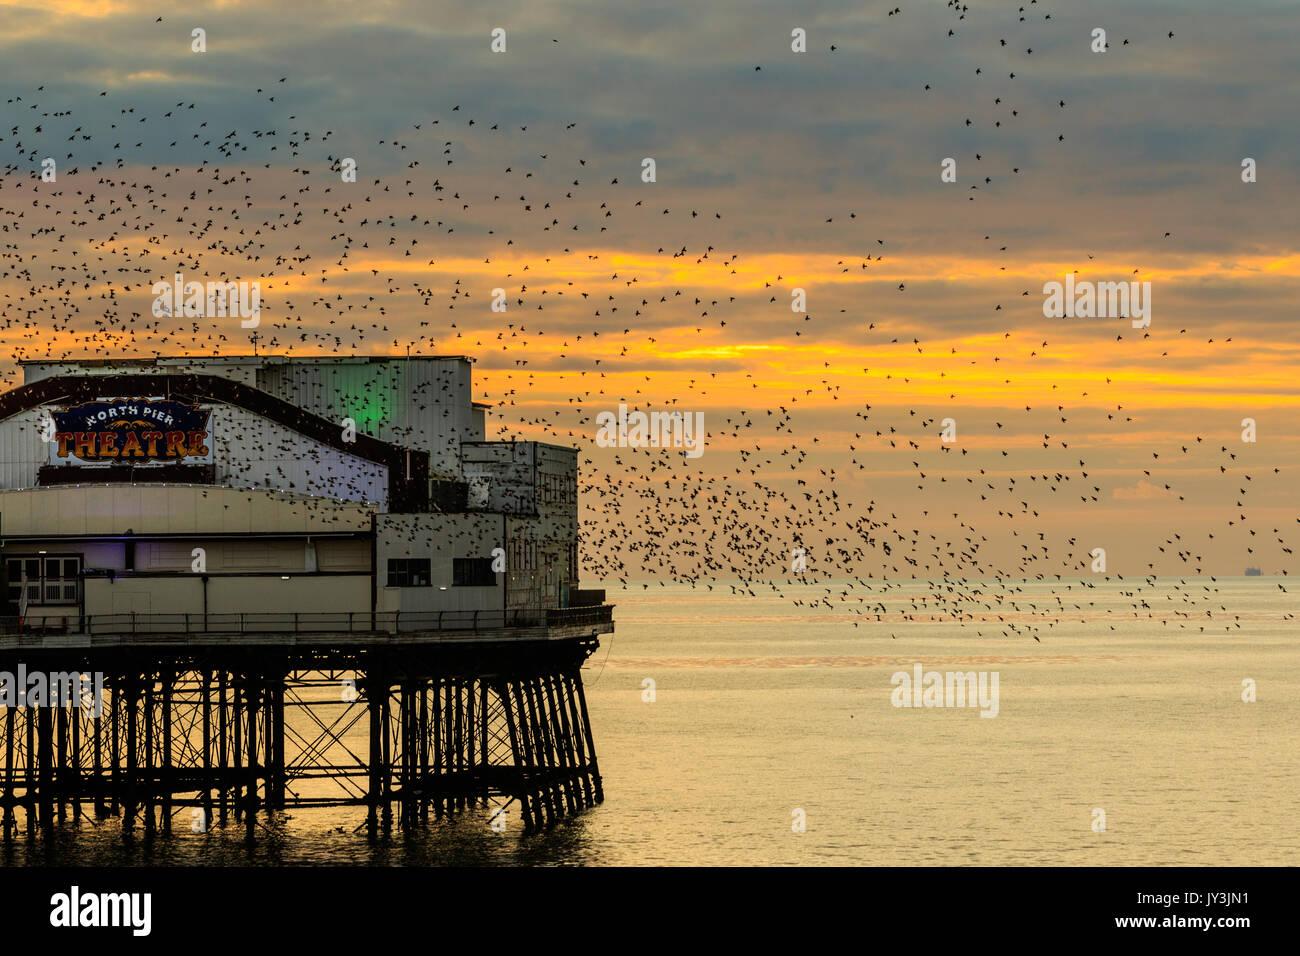 starling murmuration at Blackpool north pier UK - Stock Image